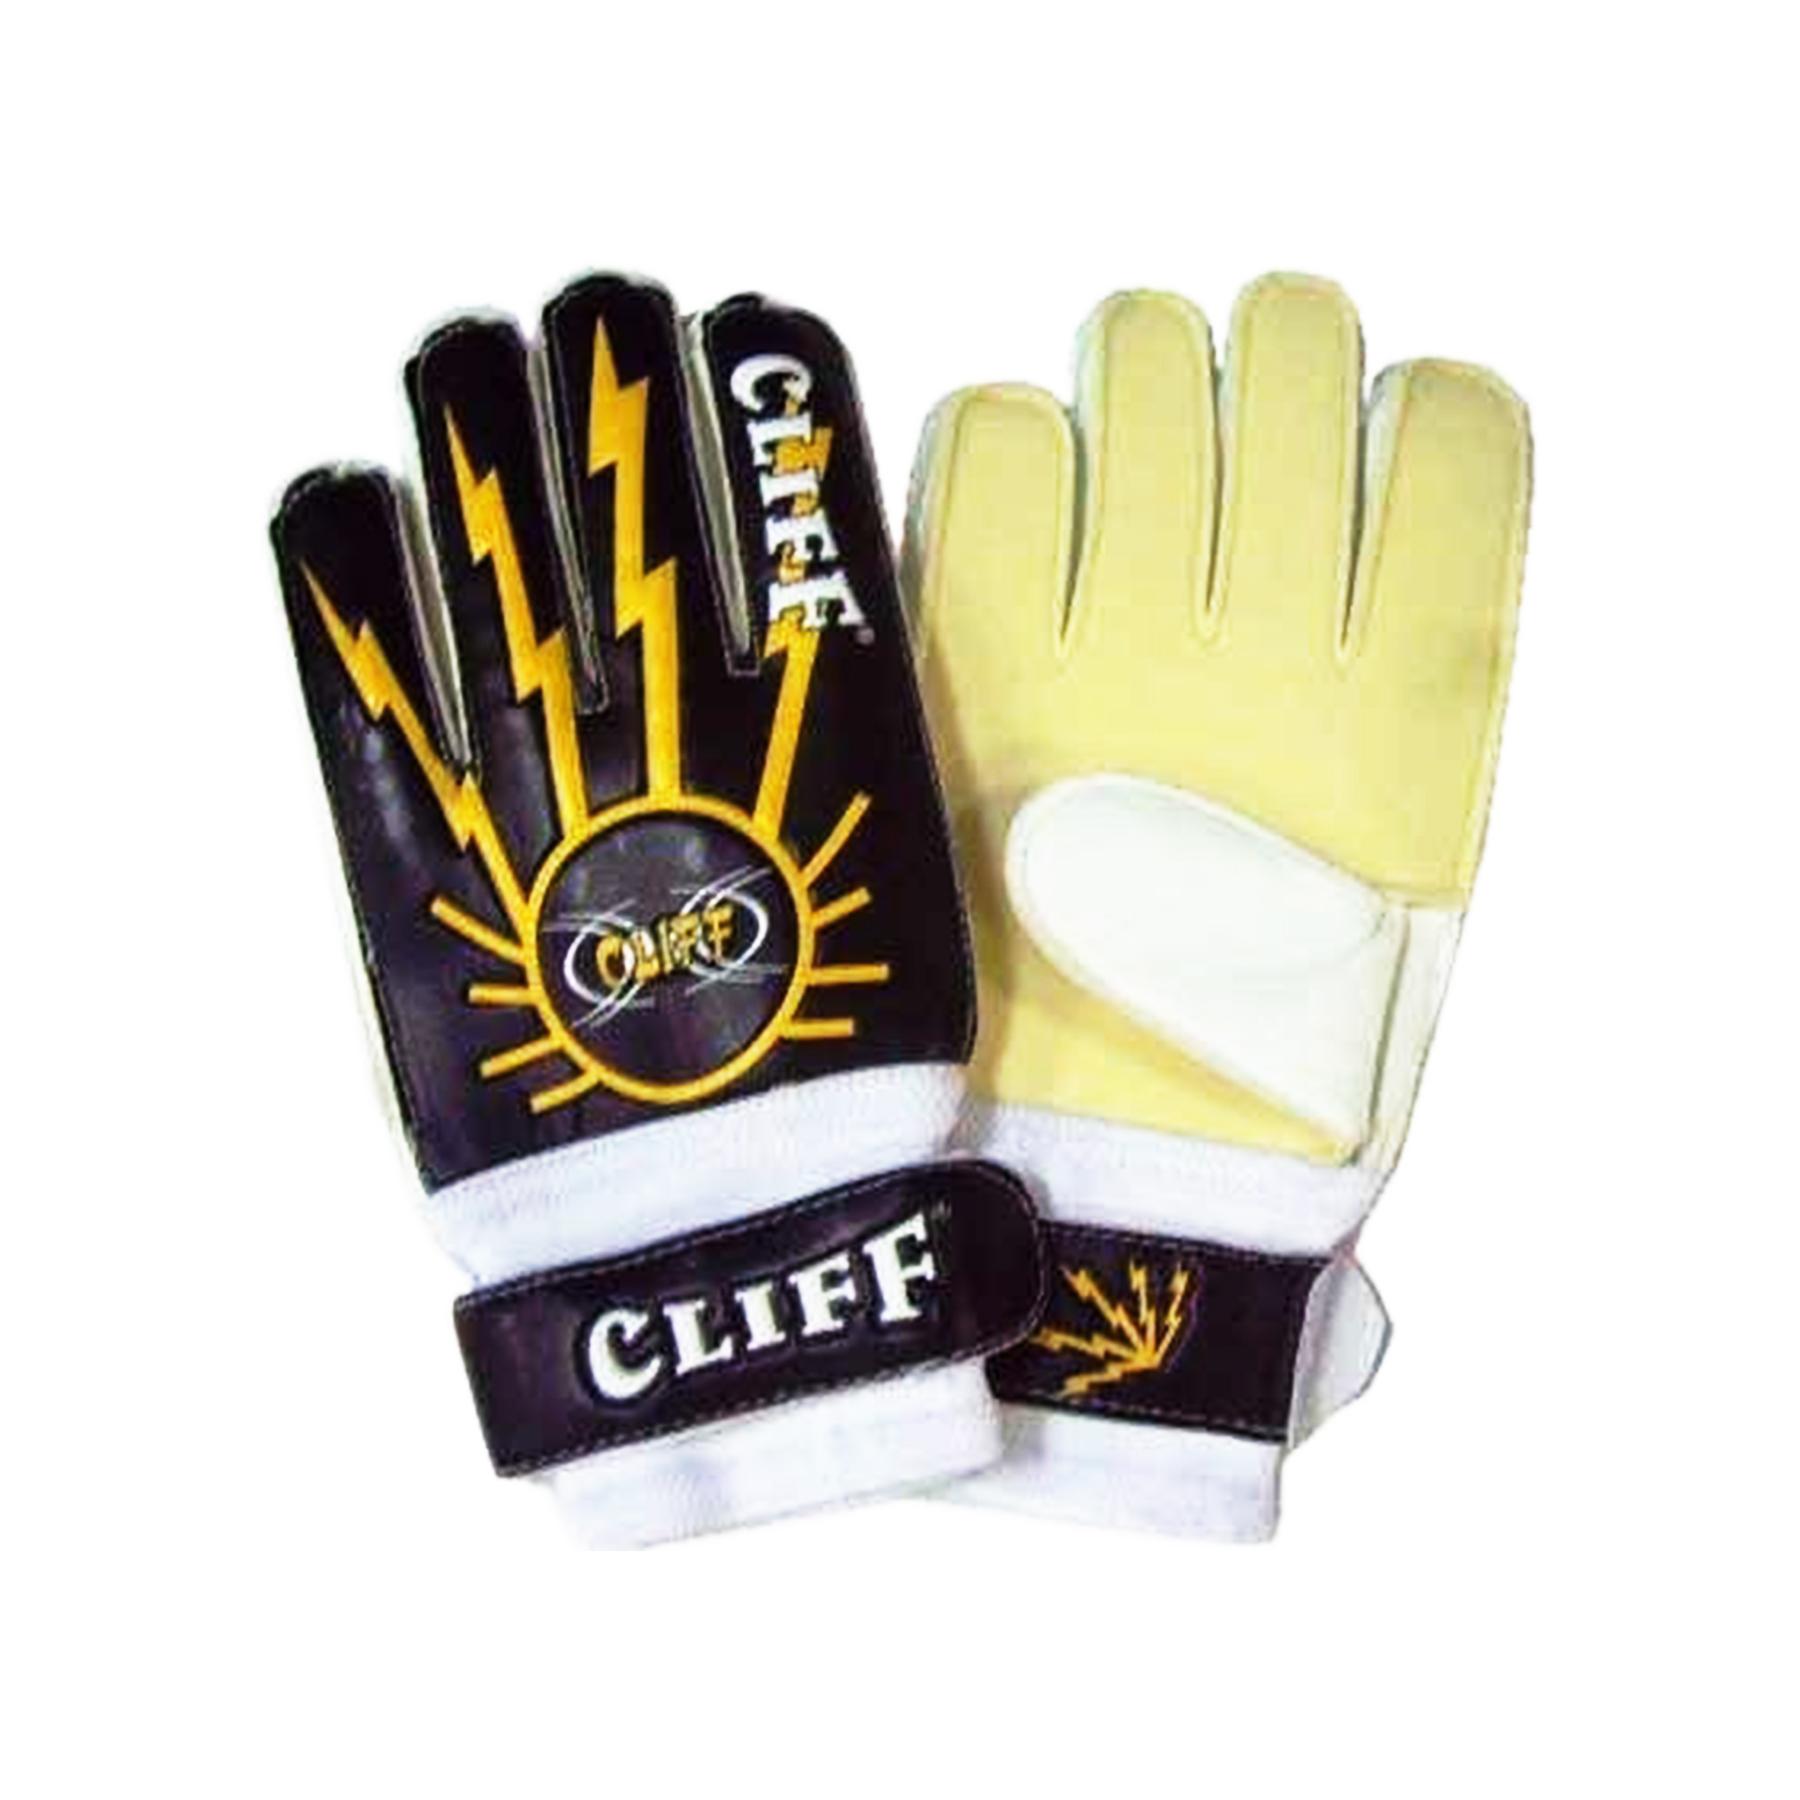 Перчатки вратарские CLIFF Stick (латекс/ПУ)  р. 11/XL